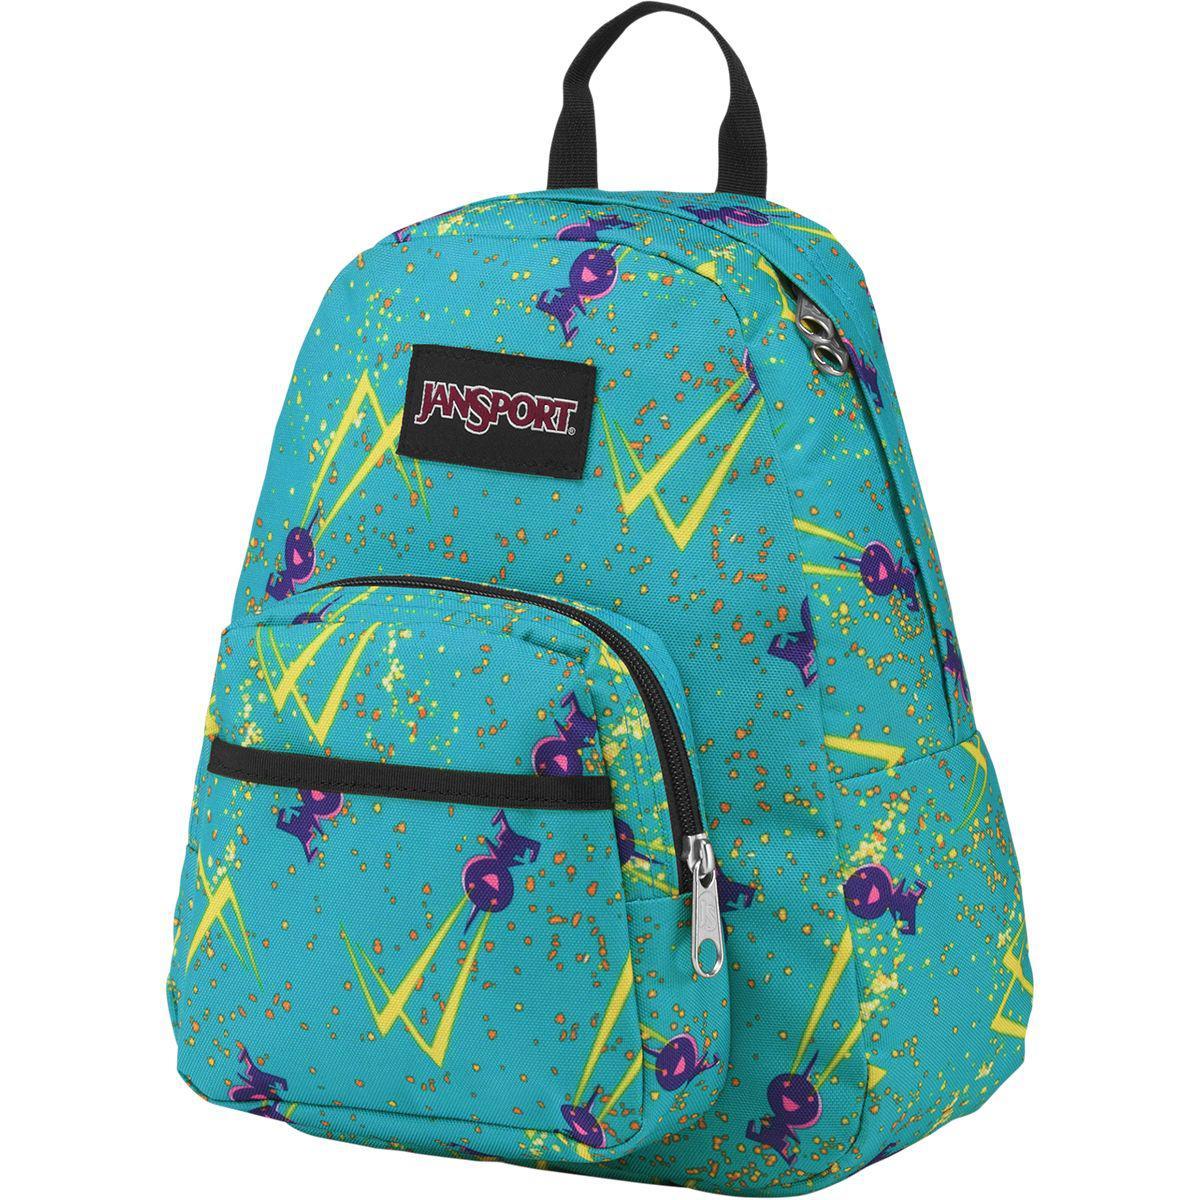 Lyst - Jansport Incredibles Half Pint 10l Backpack in Blue for Men 84a05afd3e253